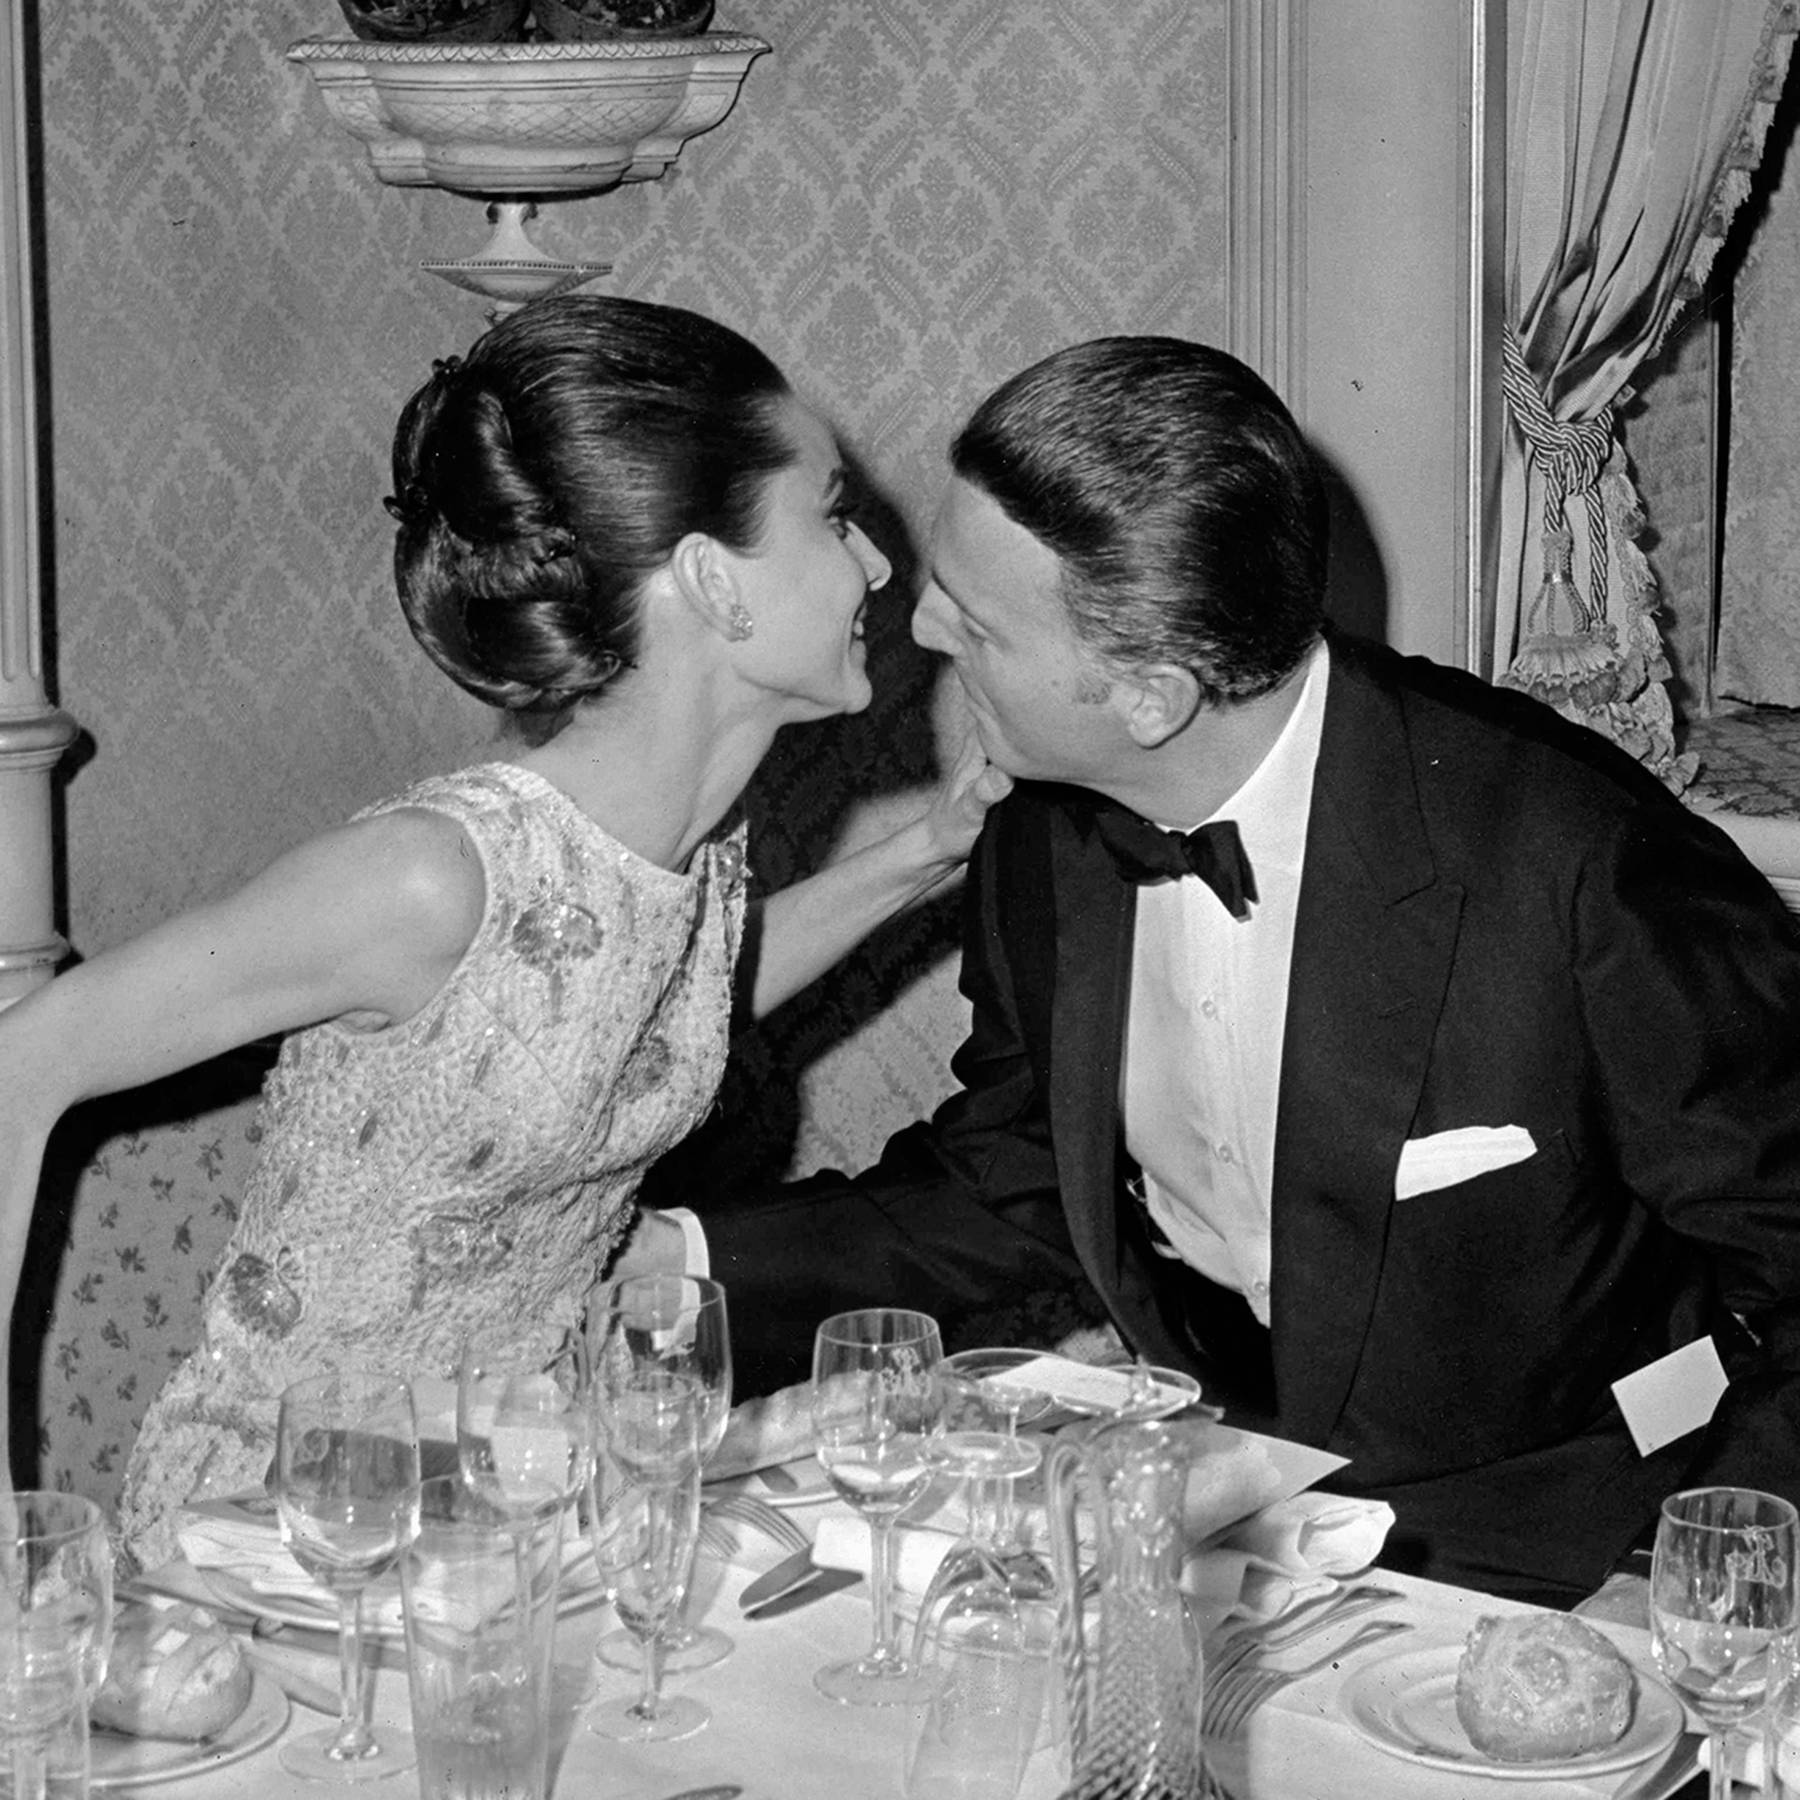 d04277058fb Givenchy's L'Interdit perfume inspired by Audrey Hepburn | Tatler